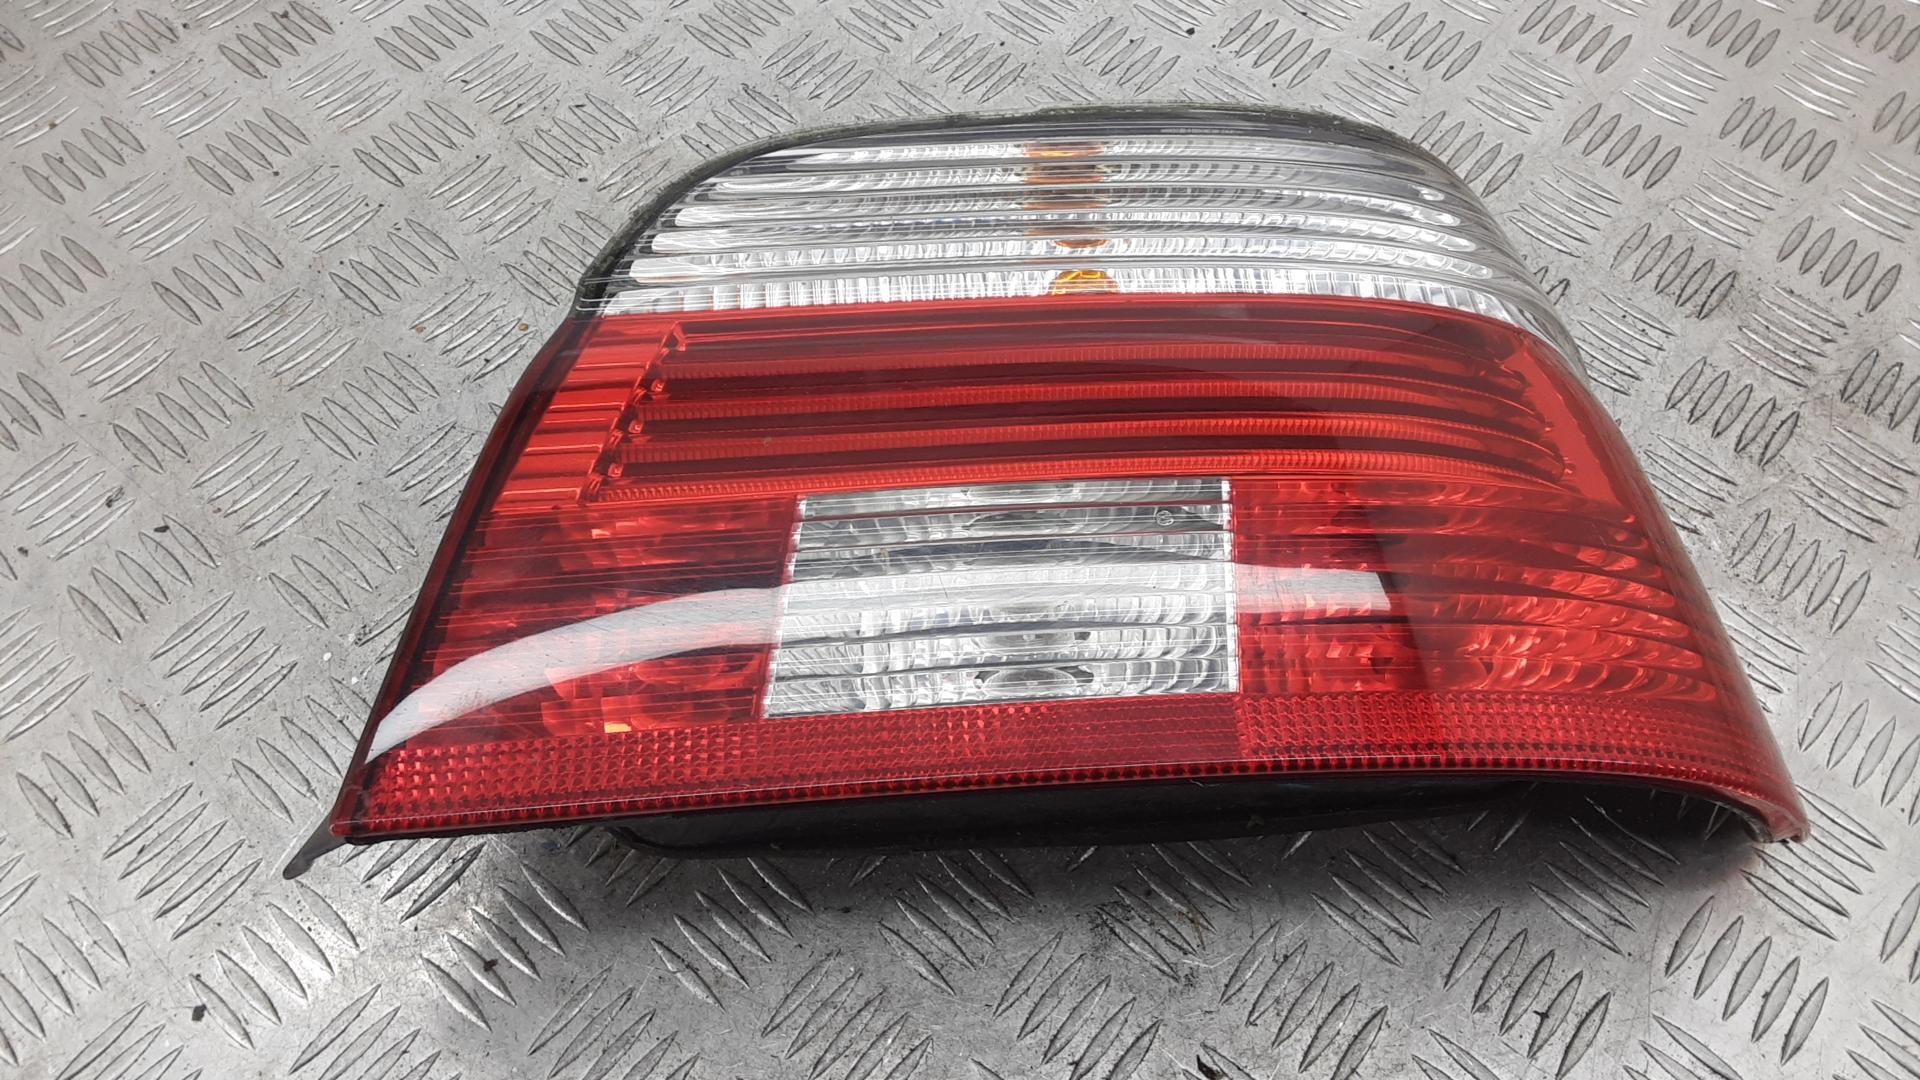 Фонарь задний правый, BMW, 5 E39, 2003